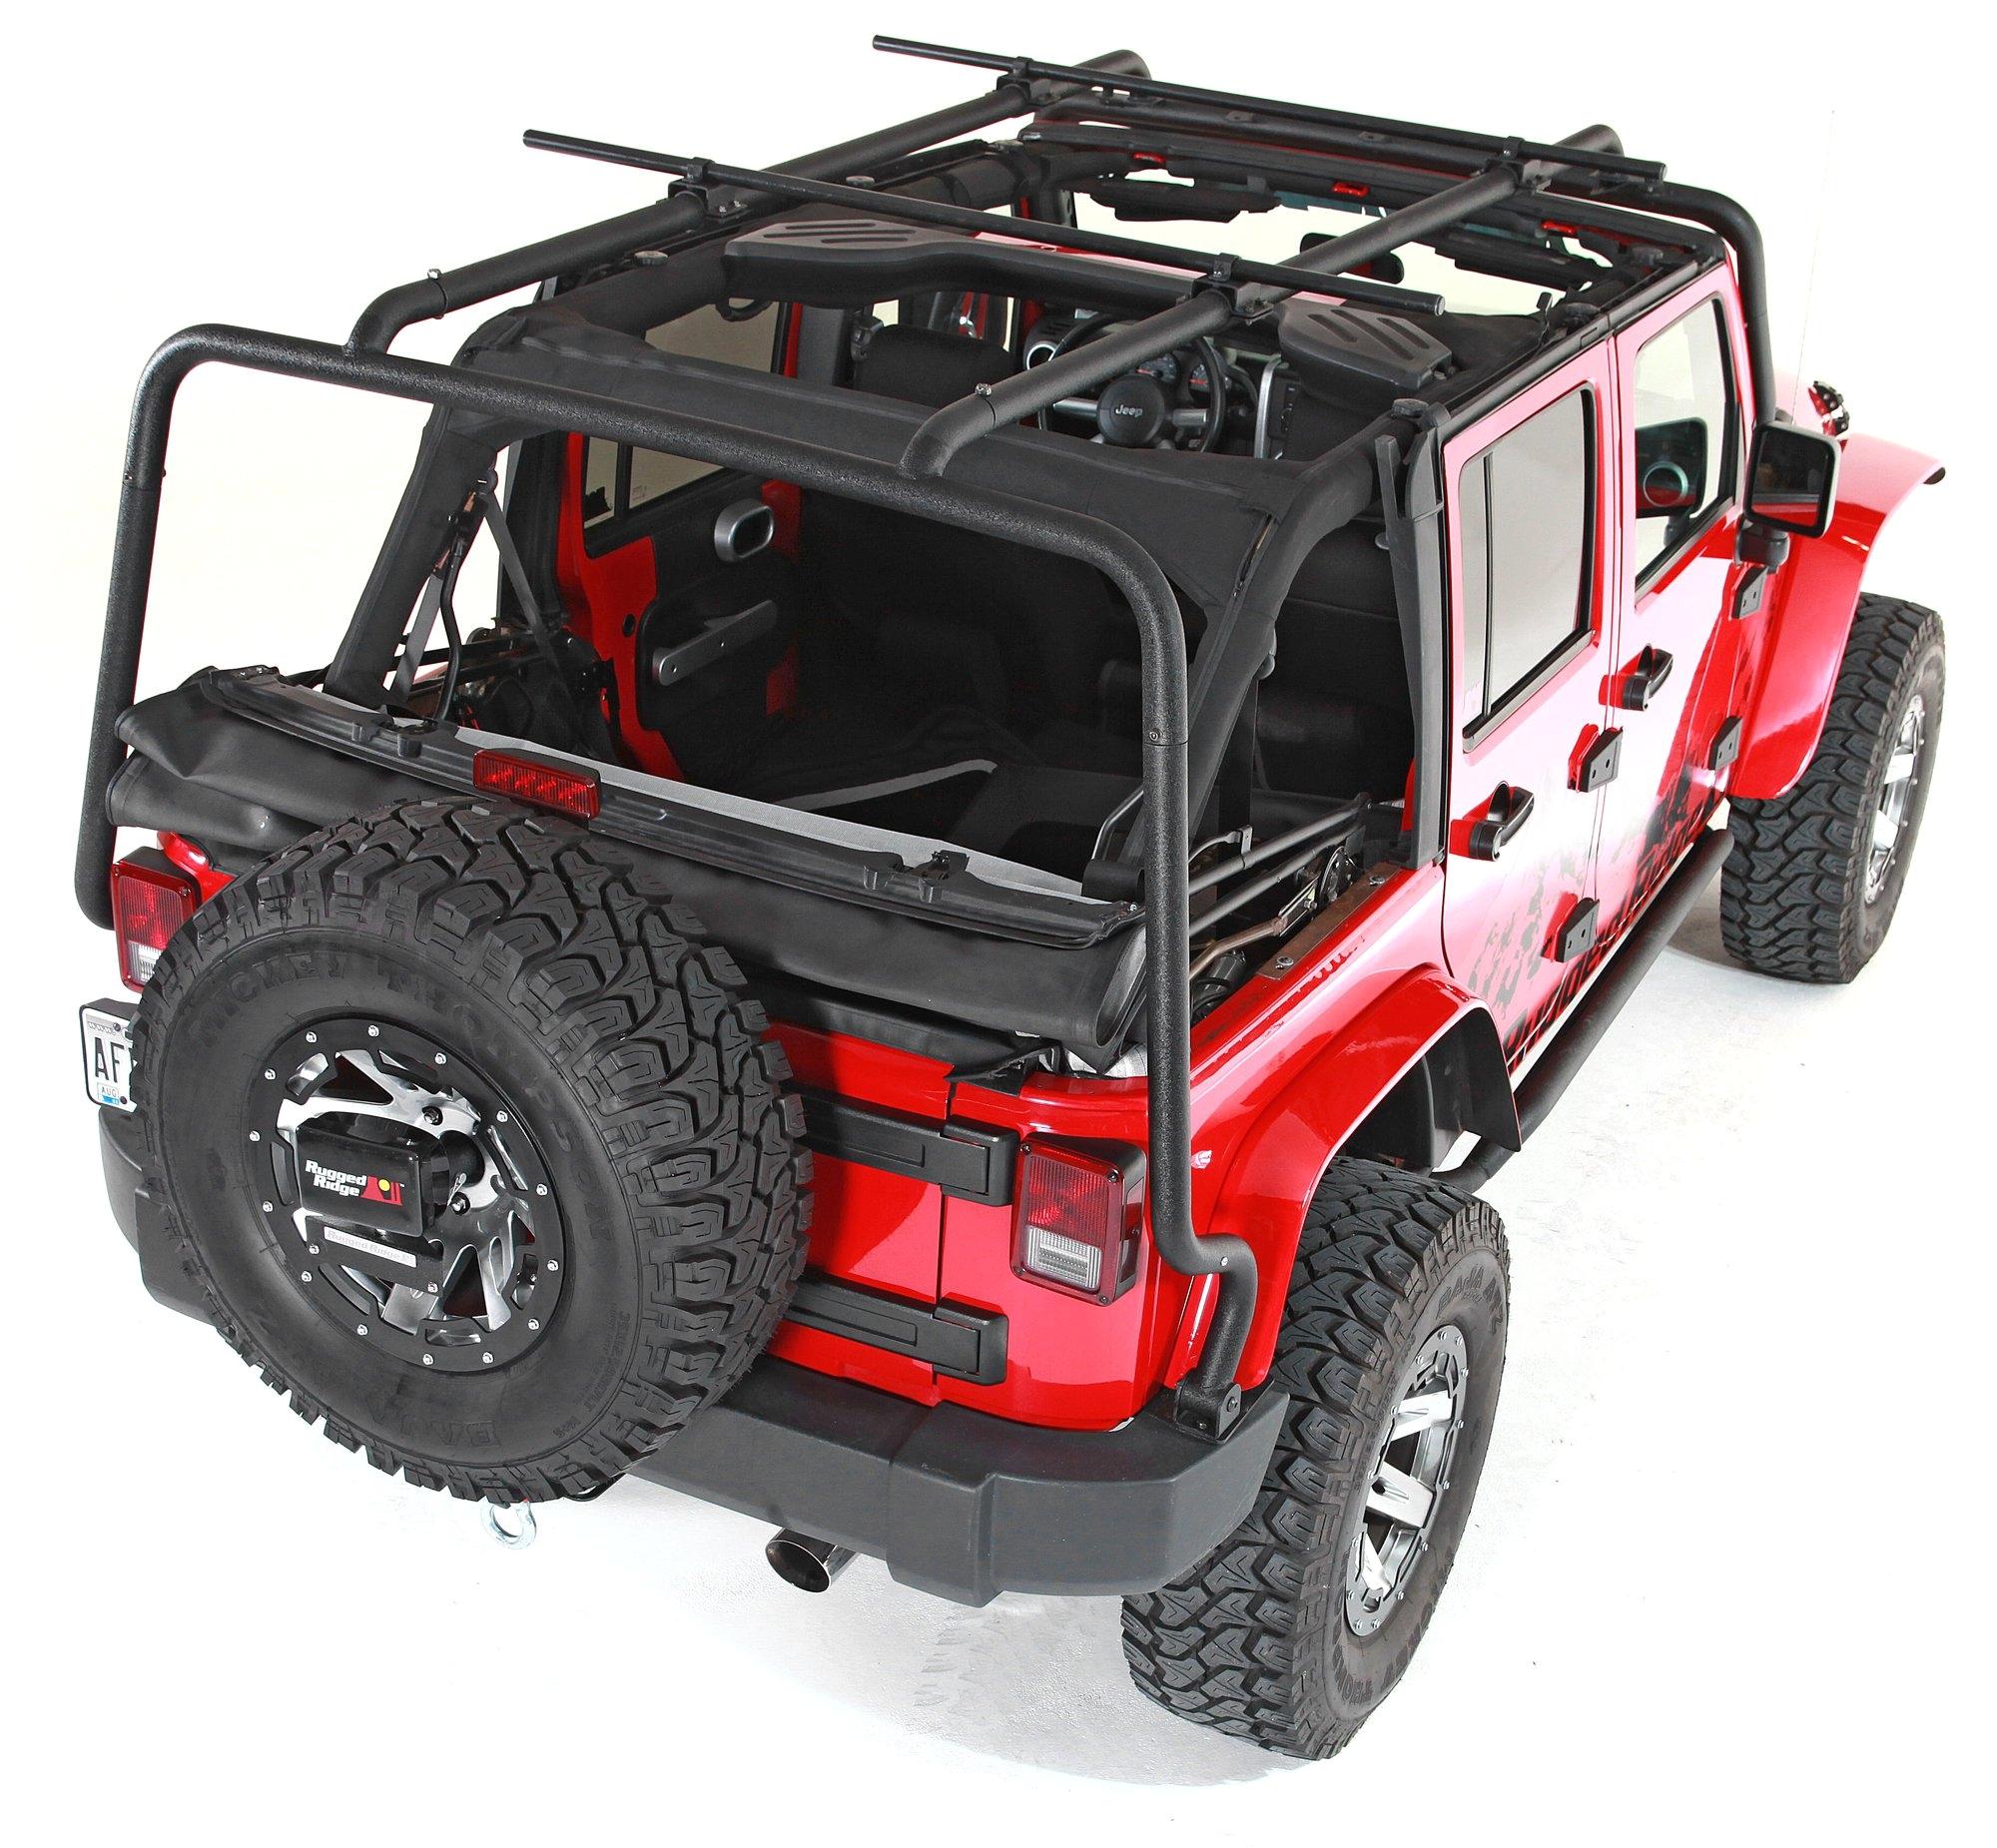 Jeep Jk Roof Rack 4 Door Rugged Ridge 11703 02 Sherpa Rack for 07 18 Jeep Wrangler Unlimited